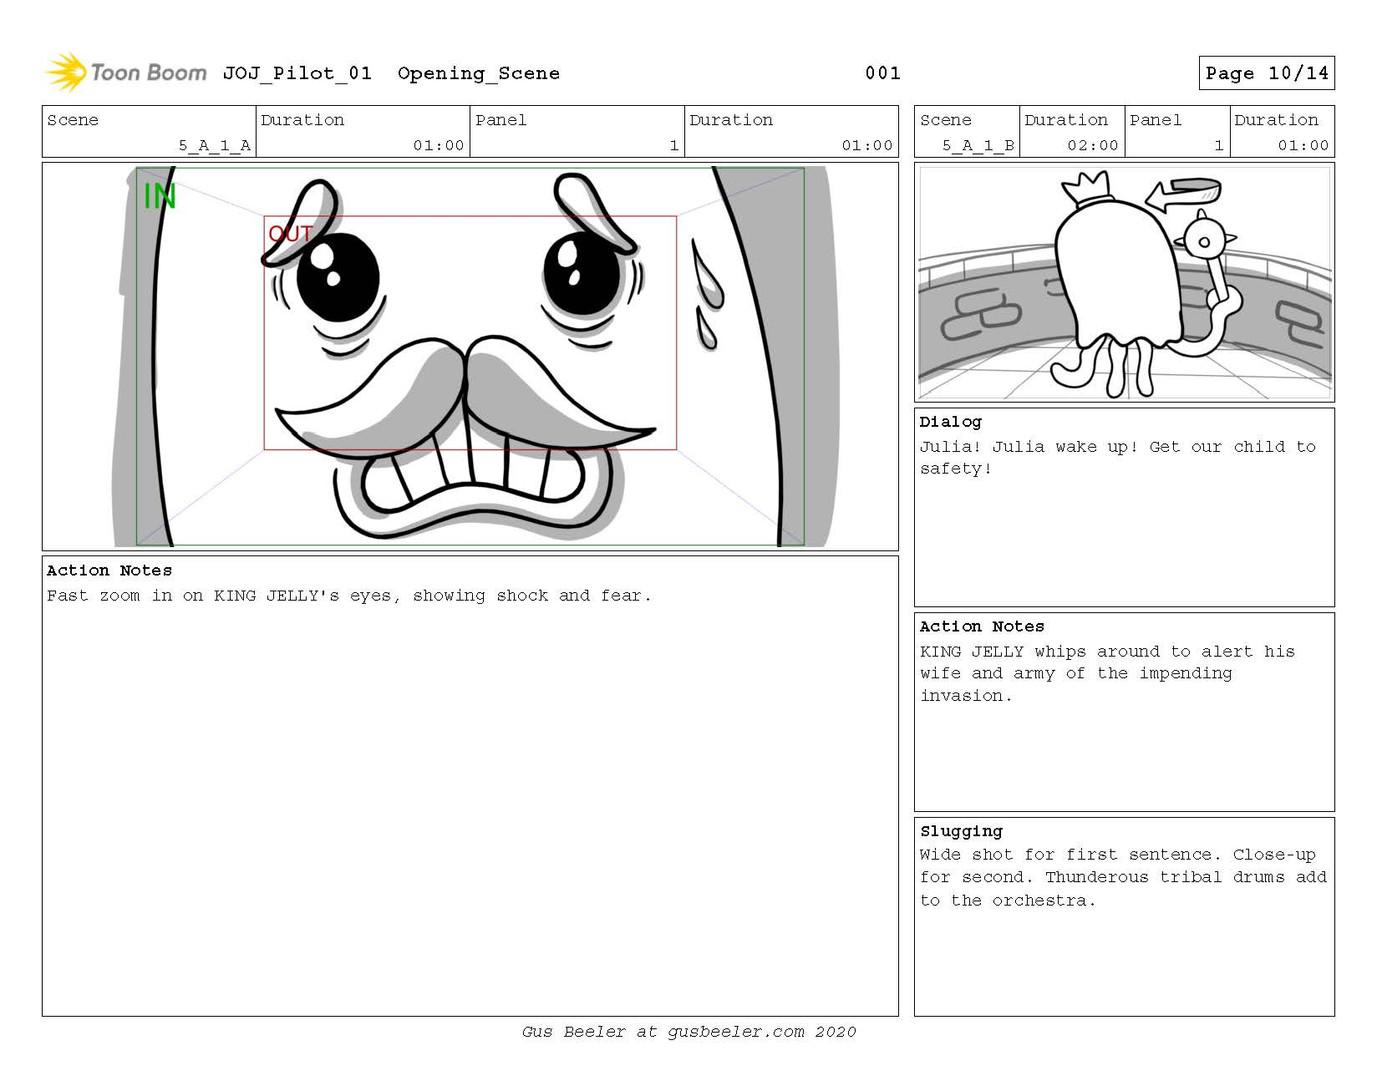 Abeeler_JOJ_Pilot_002_Page_11.jpg